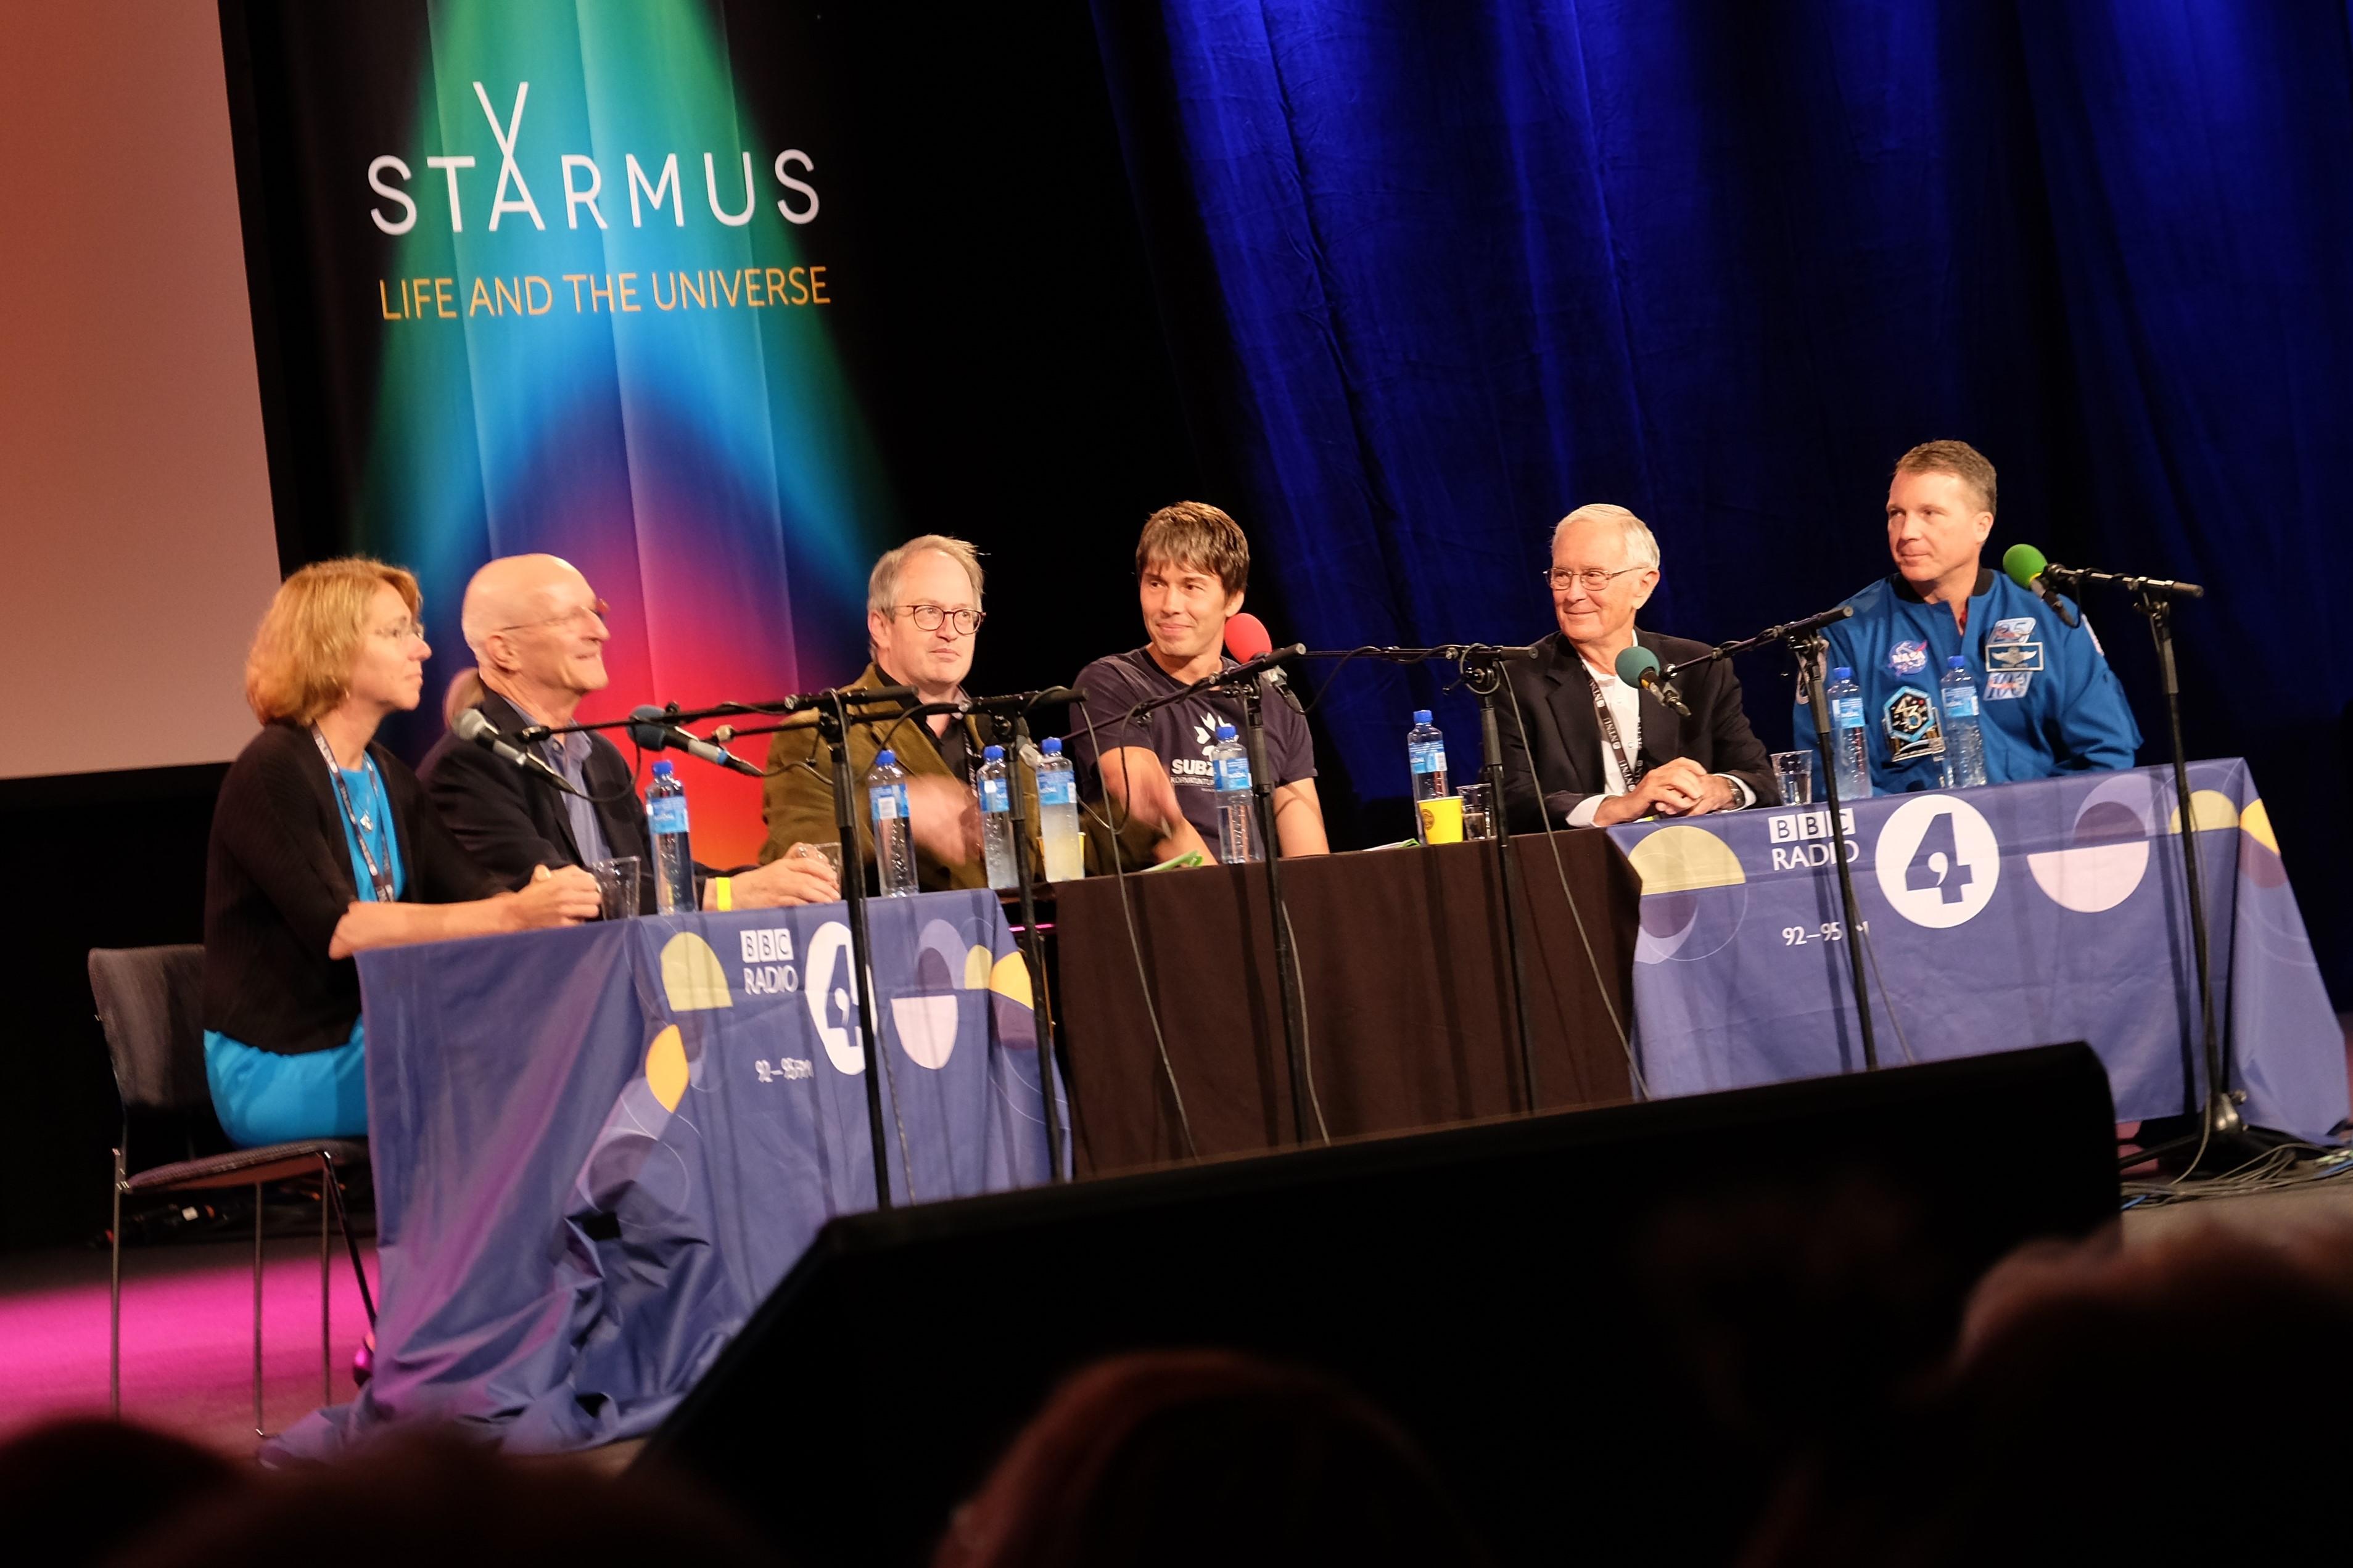 Starmus, dag 2: Apollo 11 och ISS